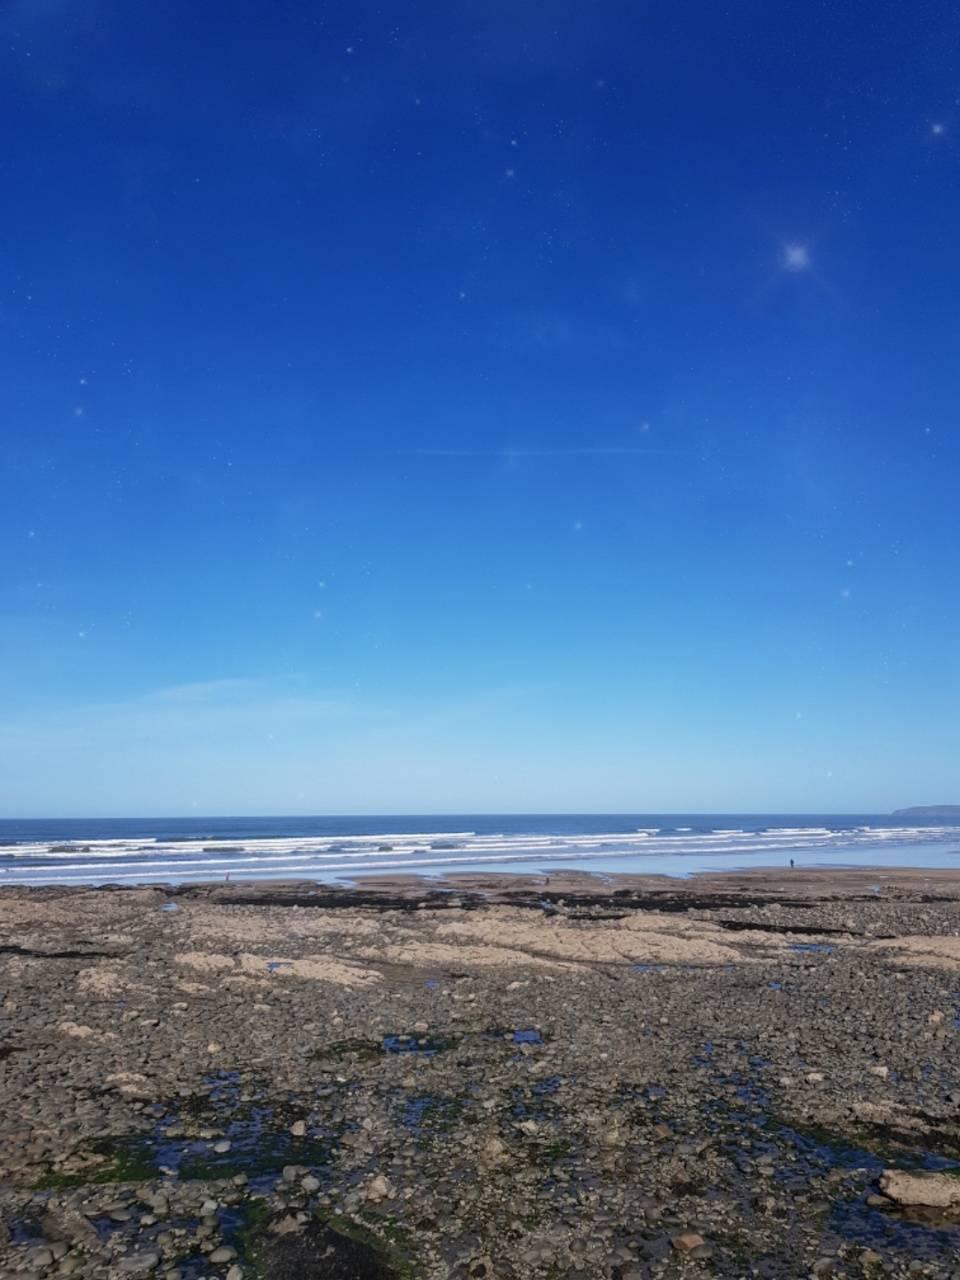 Starlit beach